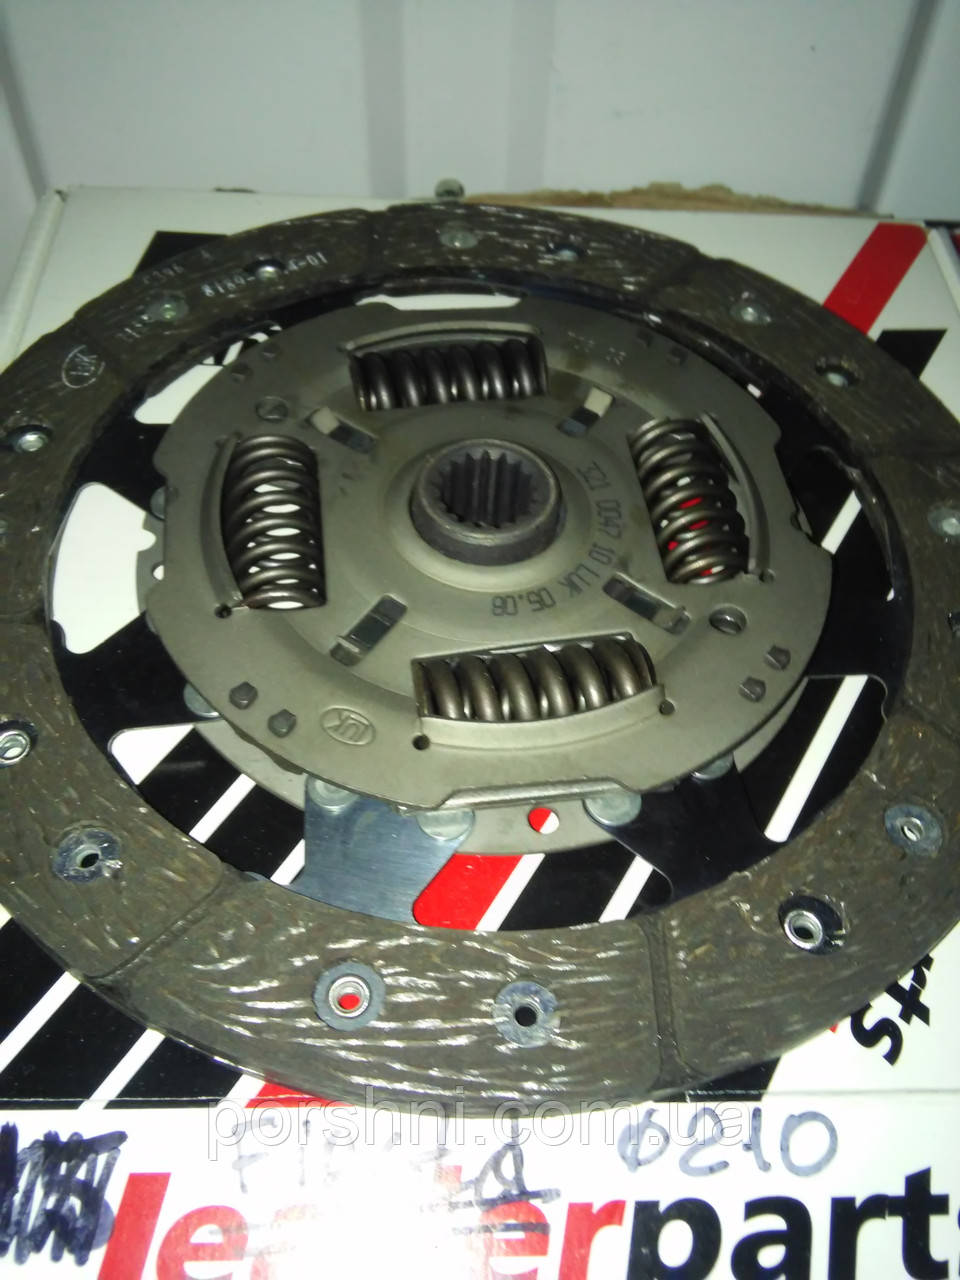 Диски  сцепления Ford  Fiesta 1.8 D 97 -  FIESTA 1.6 - 1.6 DI .робот  D 210.LEADE 321004710